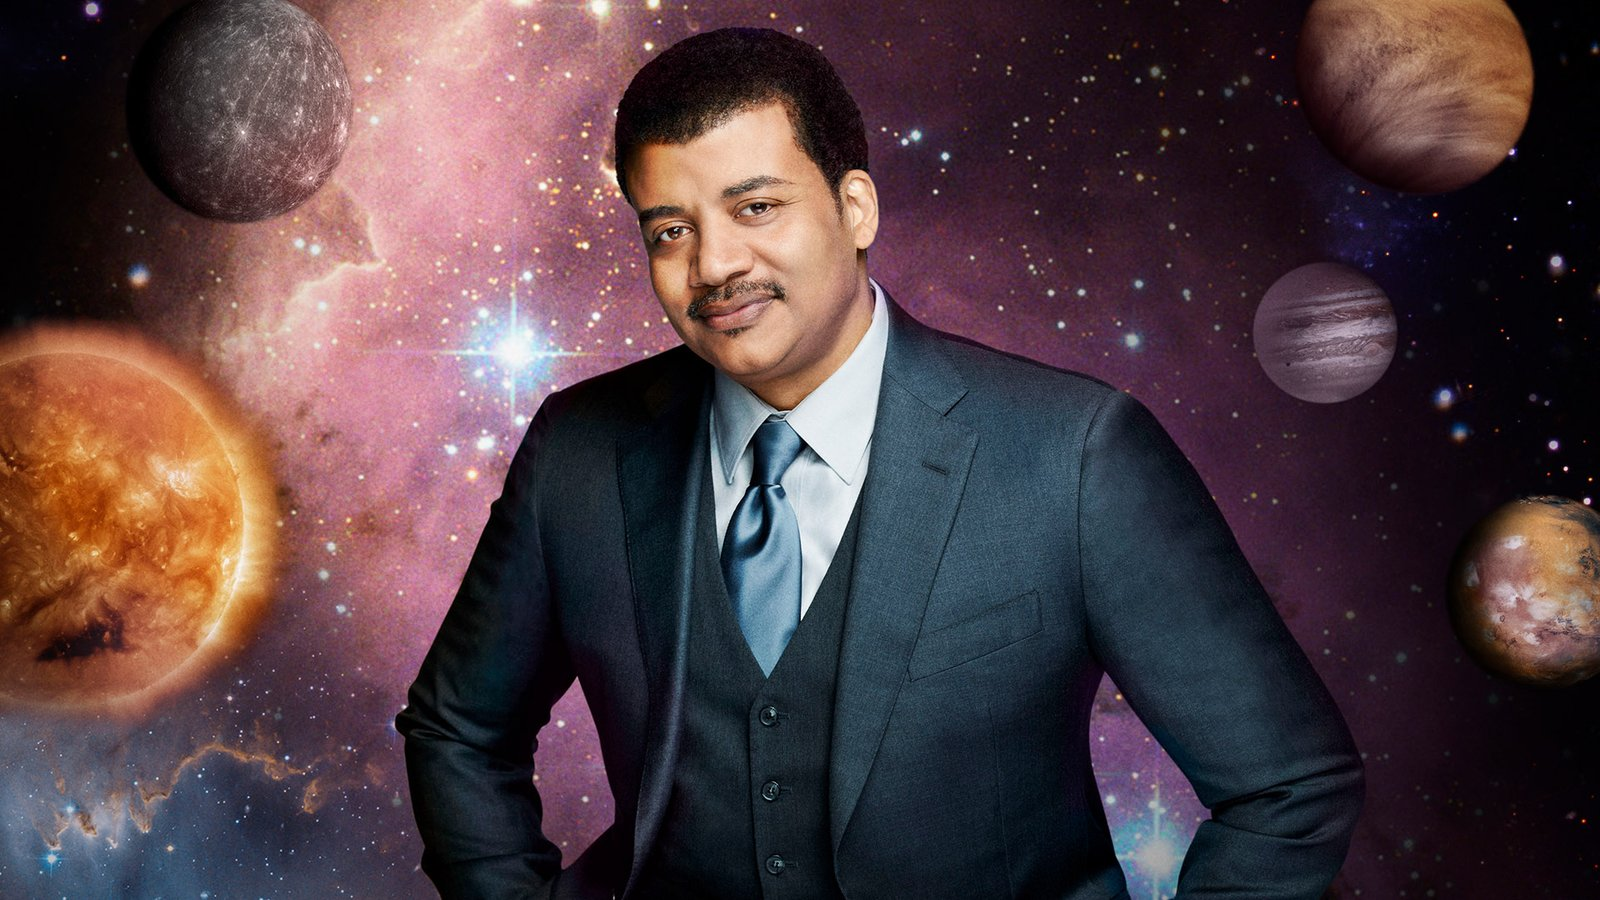 Космос / Cosmos: A Spacetime Odyssey